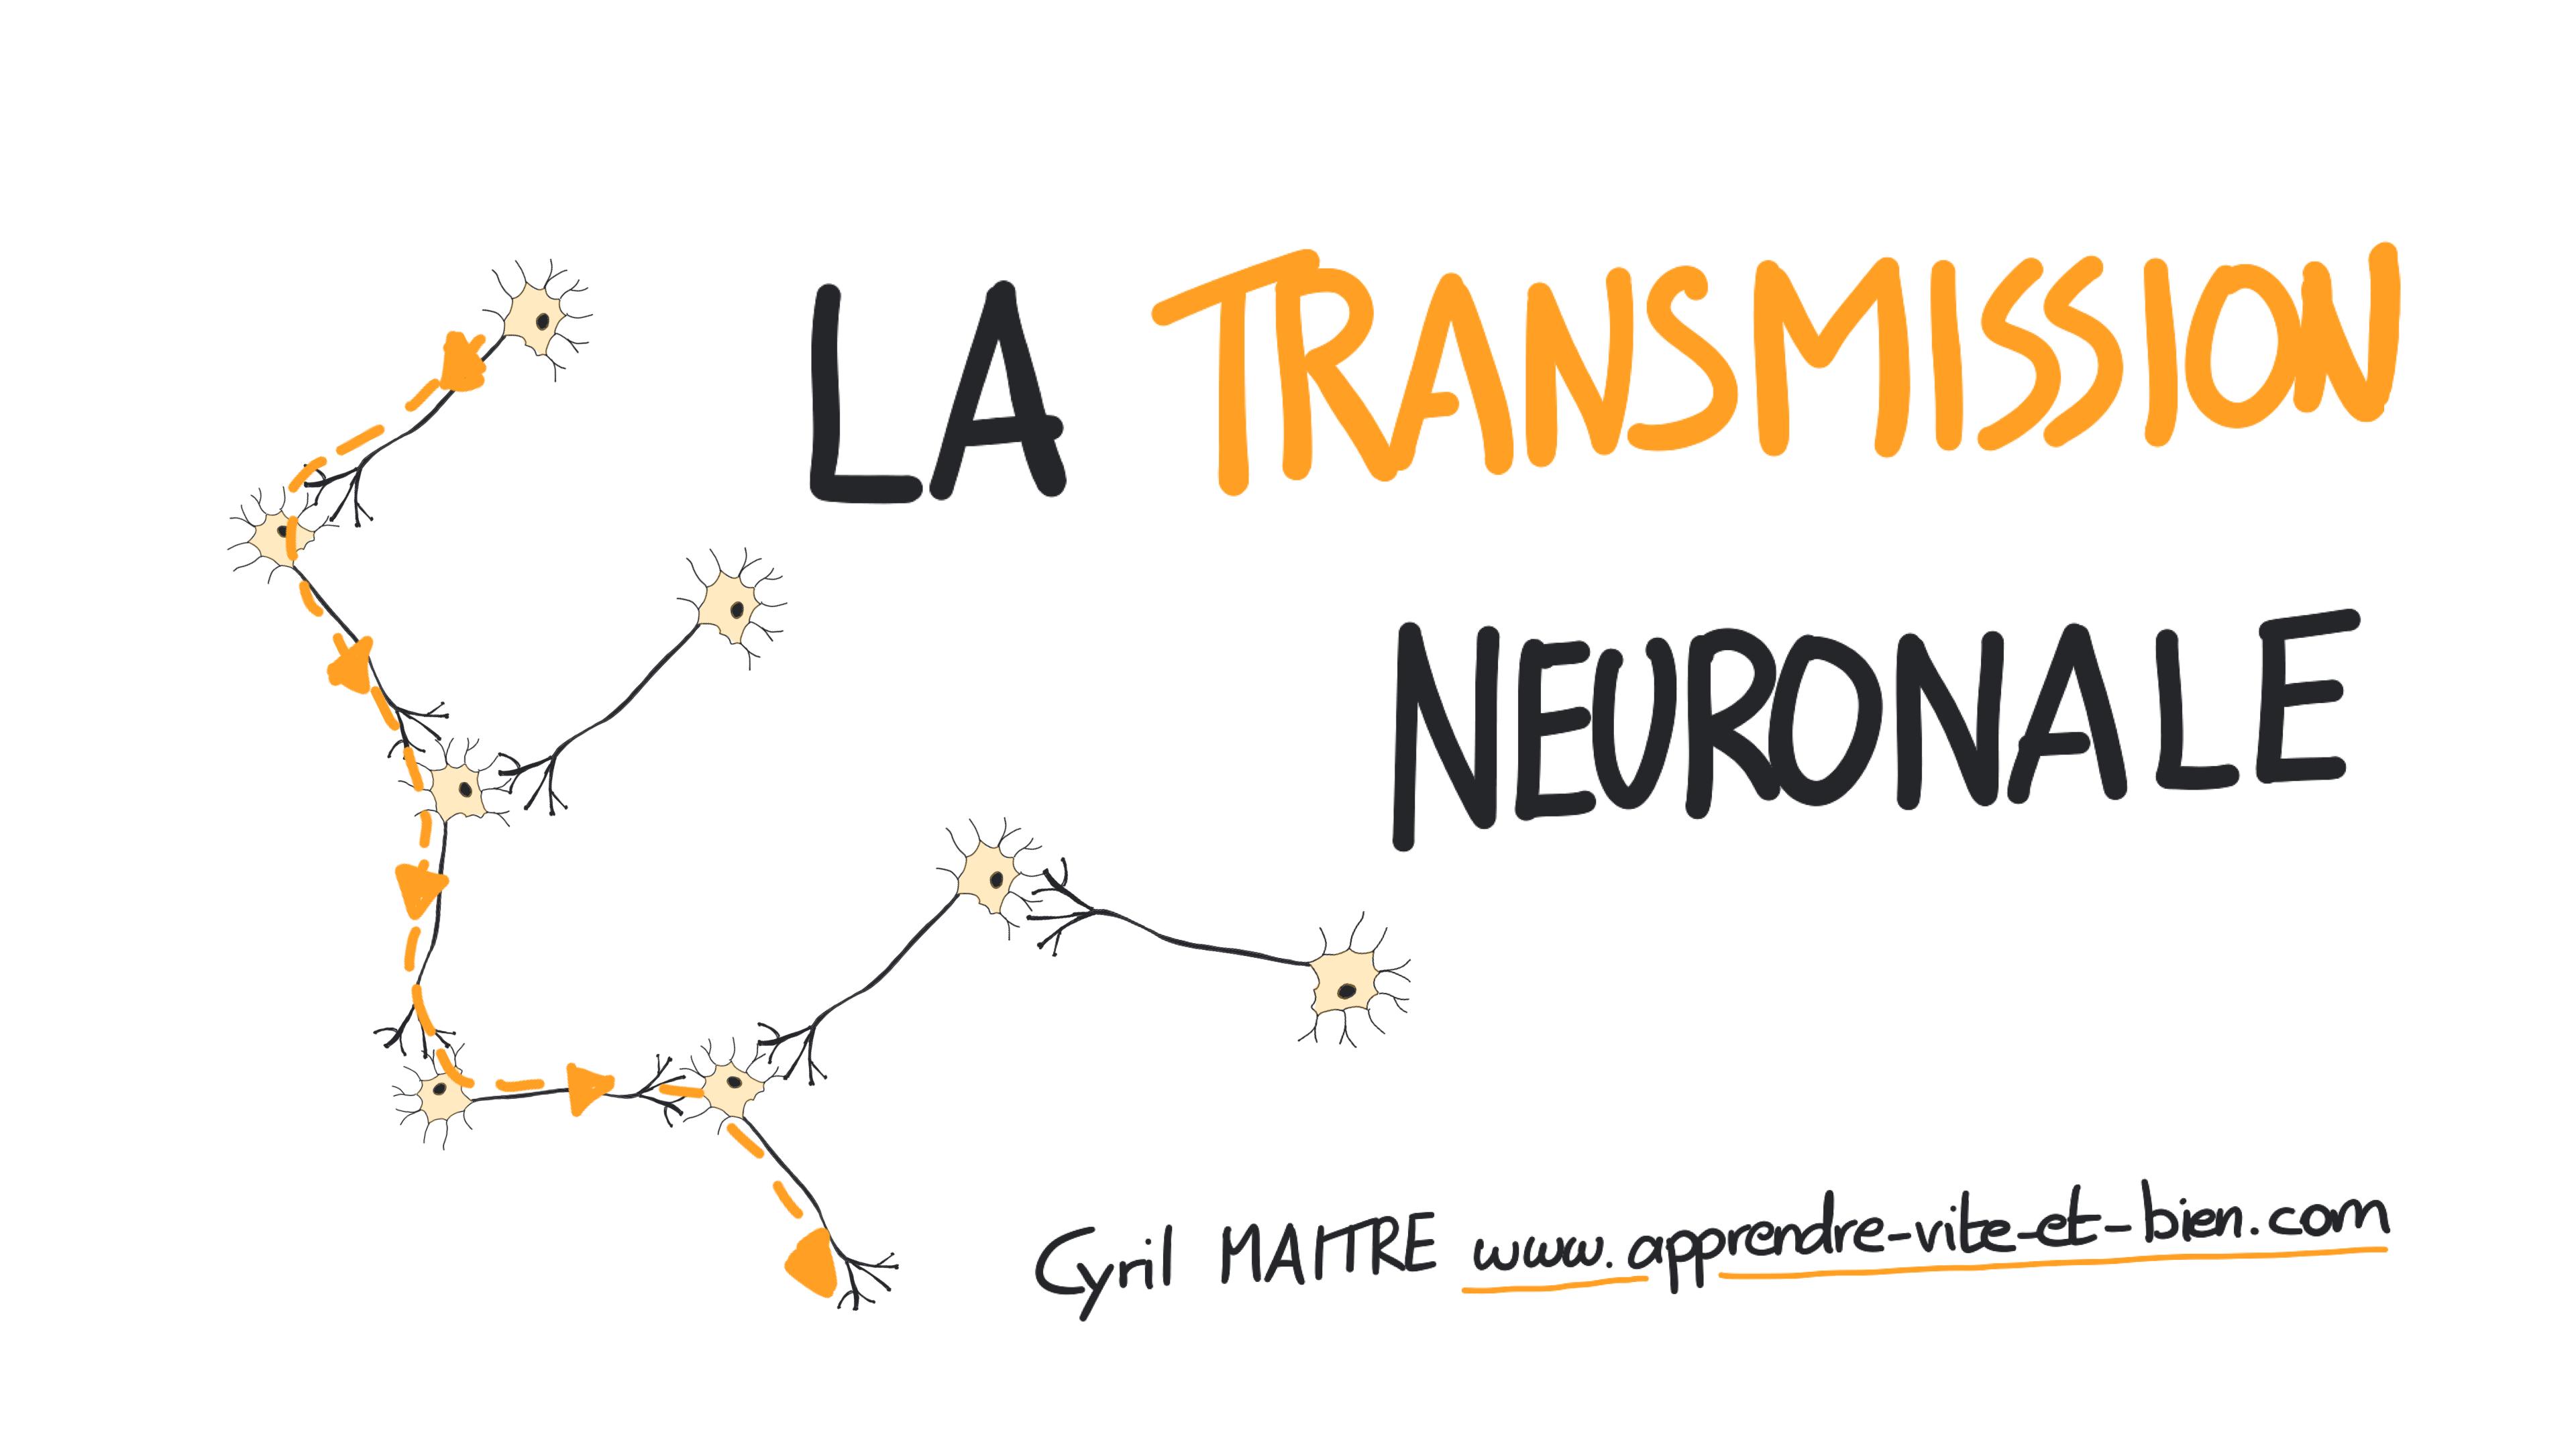 La transmission neuronale